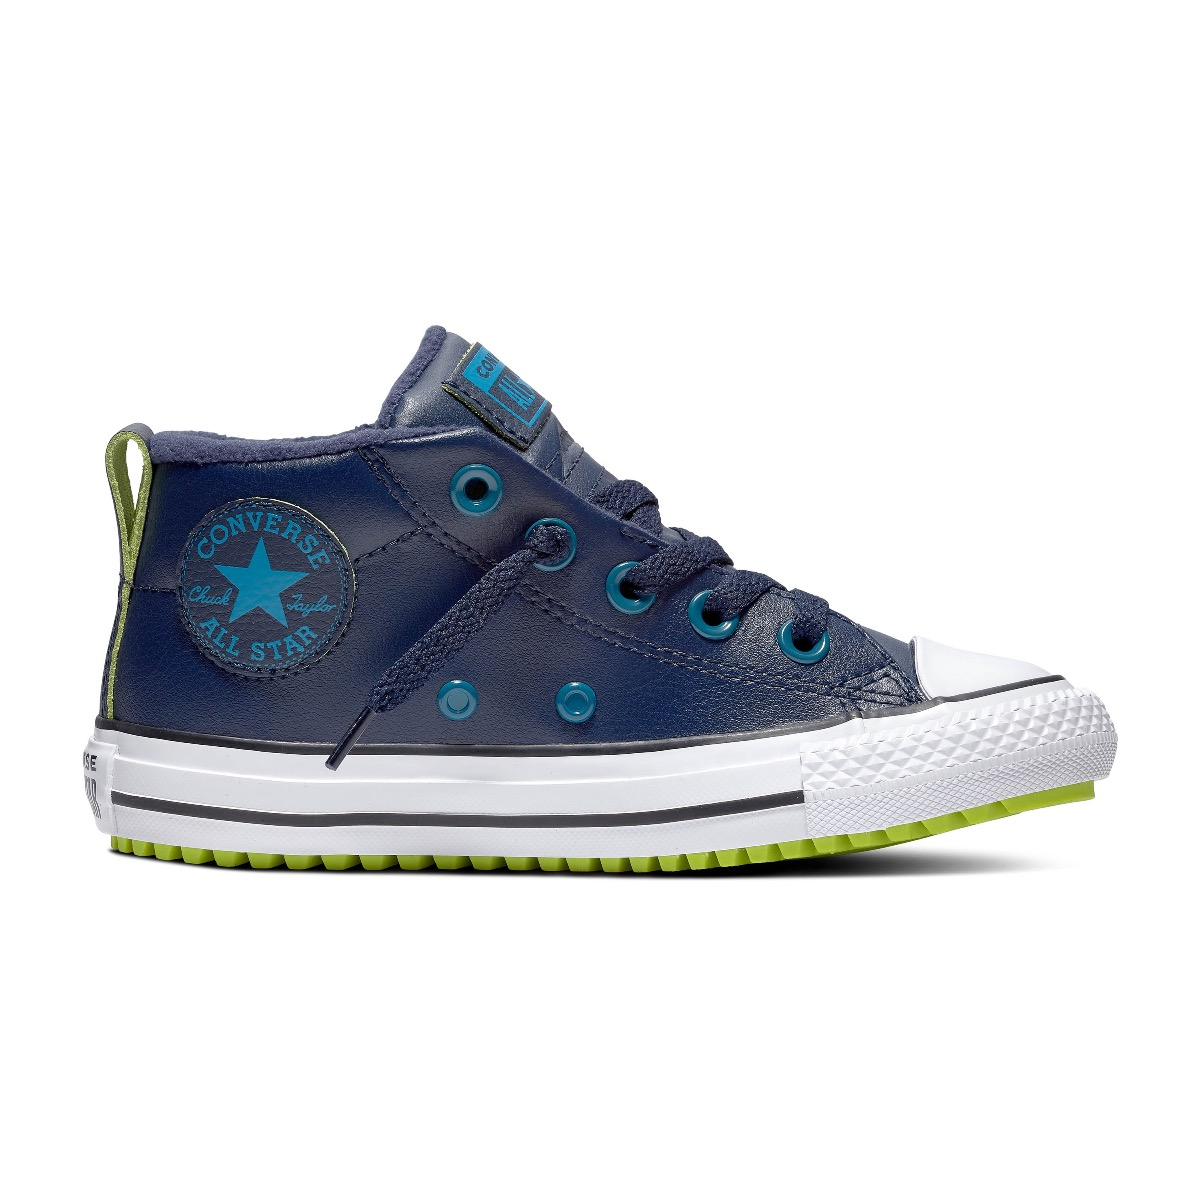 Converse All Stars Chuck Taylor Street Boot 666006C Blauw - Groen - Wit-36 maat 36